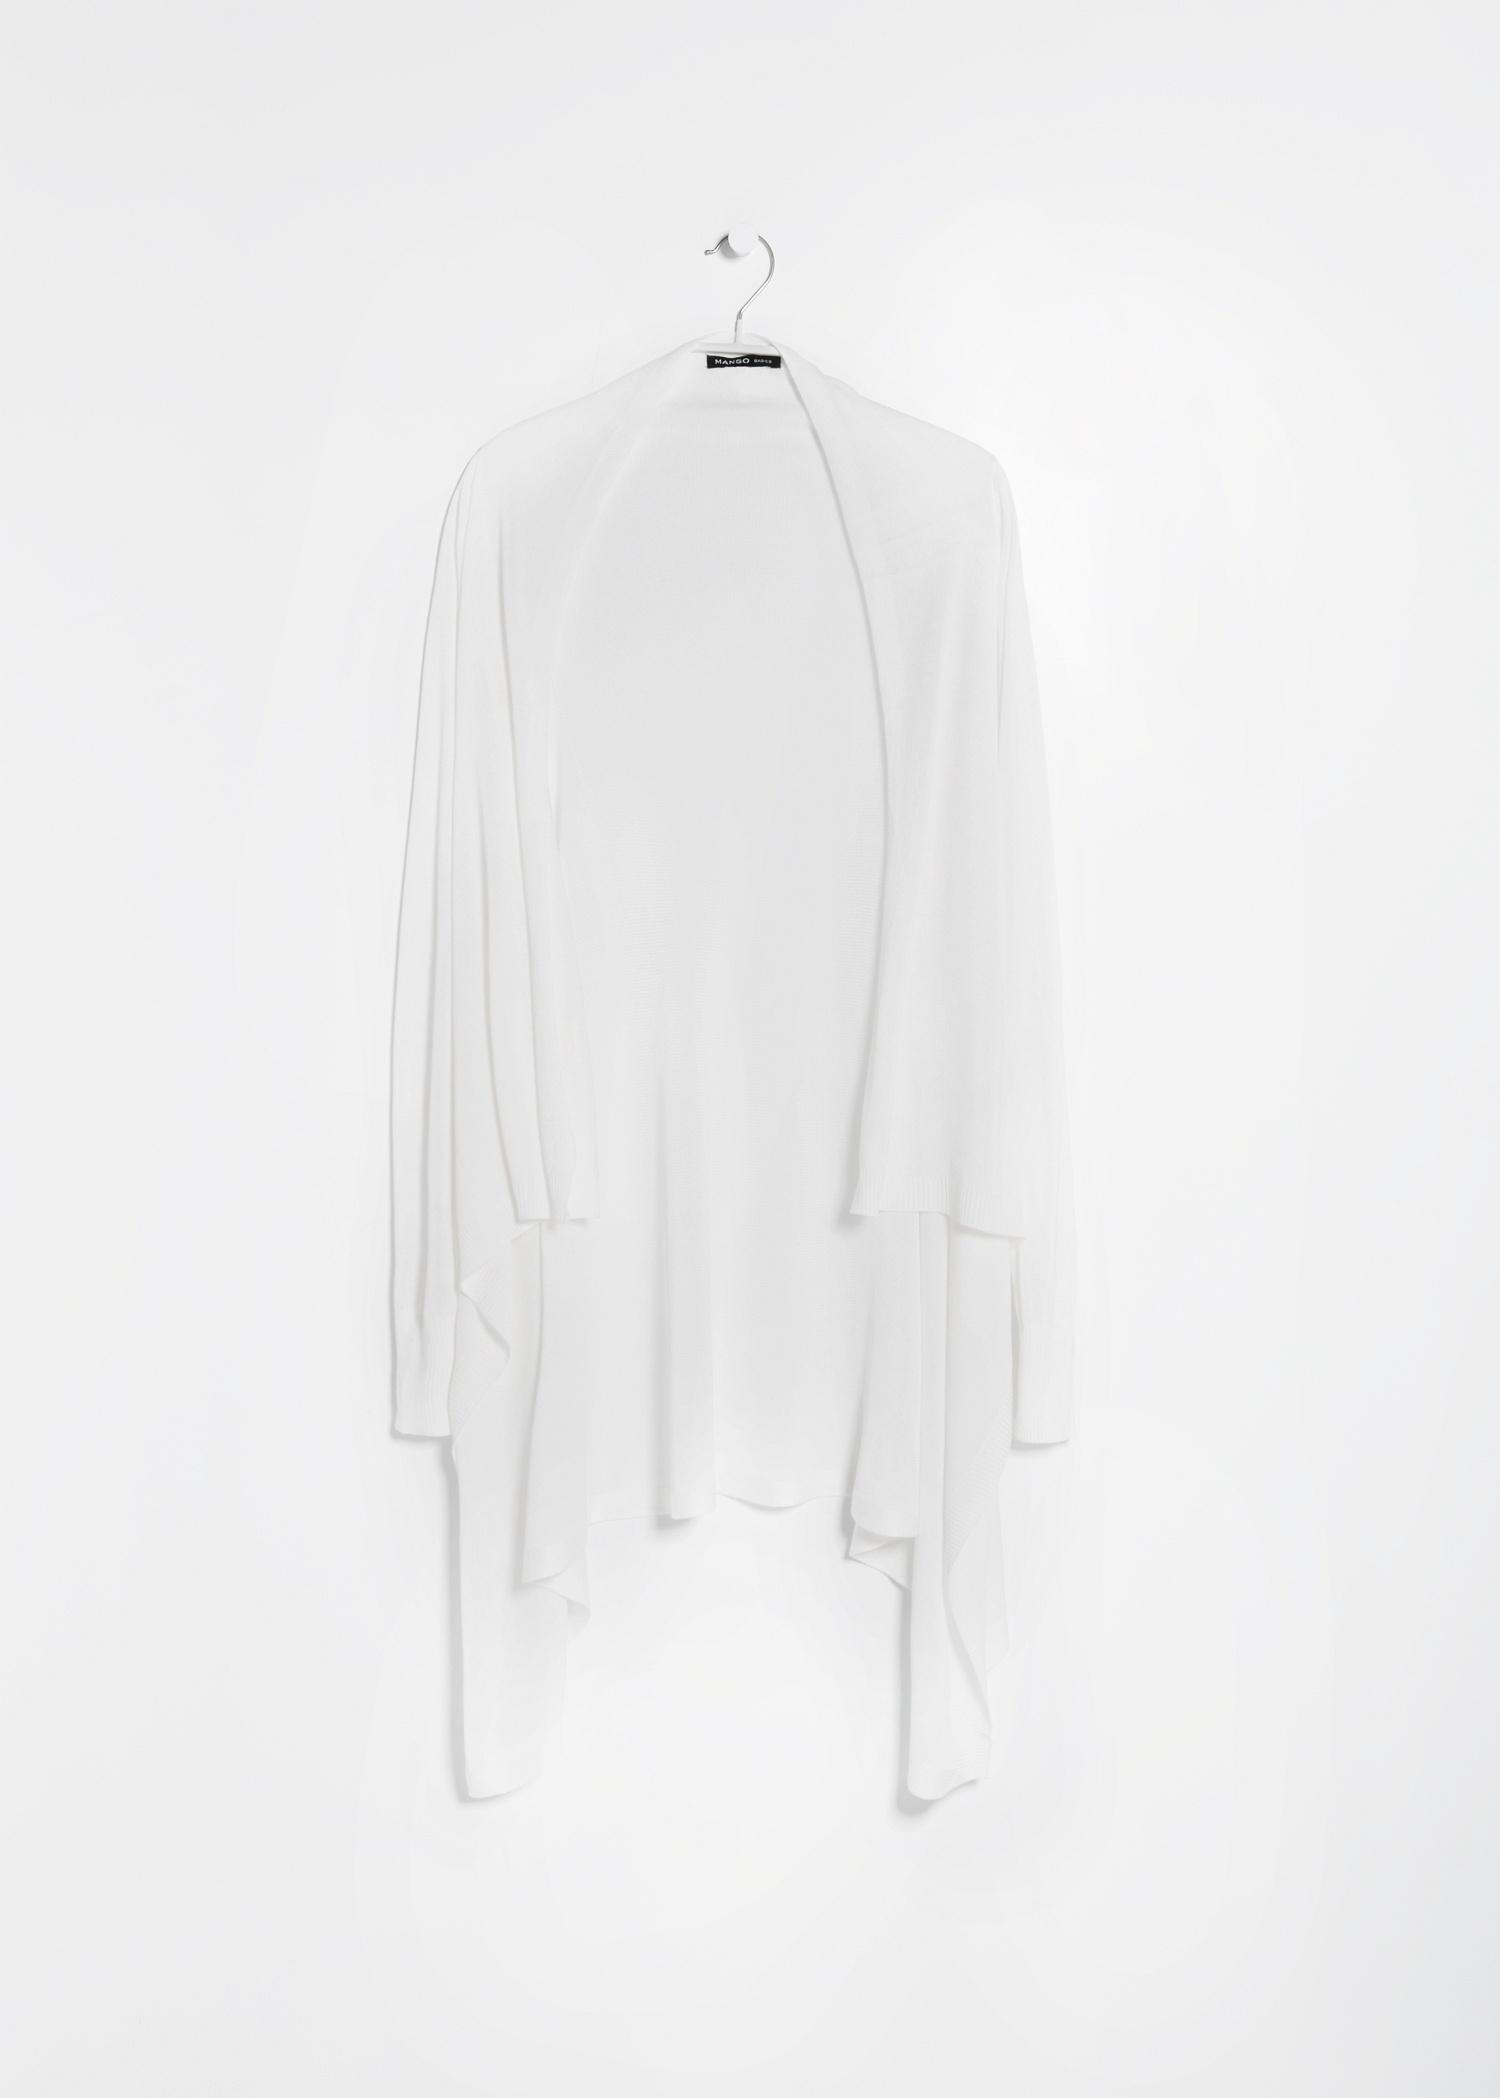 Mango Waterfall Cardigan in White | Lyst